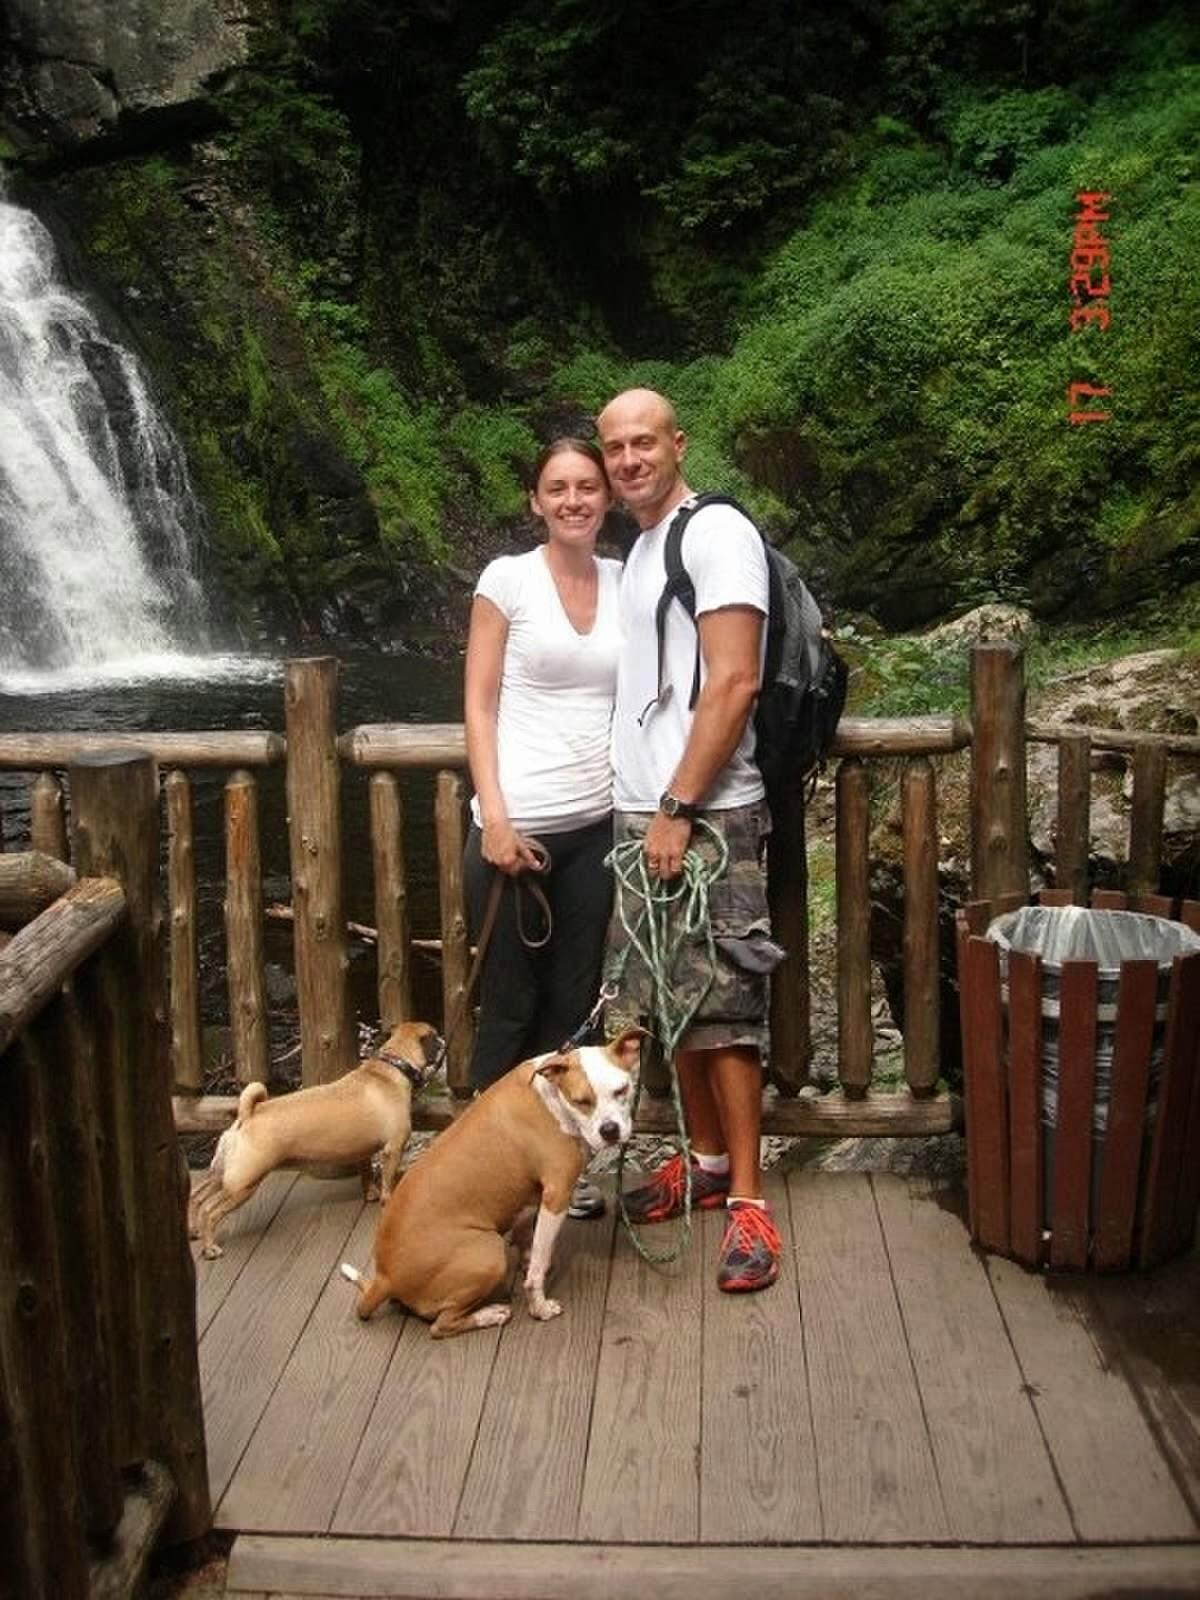 Hiking Tails: Split Rock Reservoir, Rockaway Township, NJ